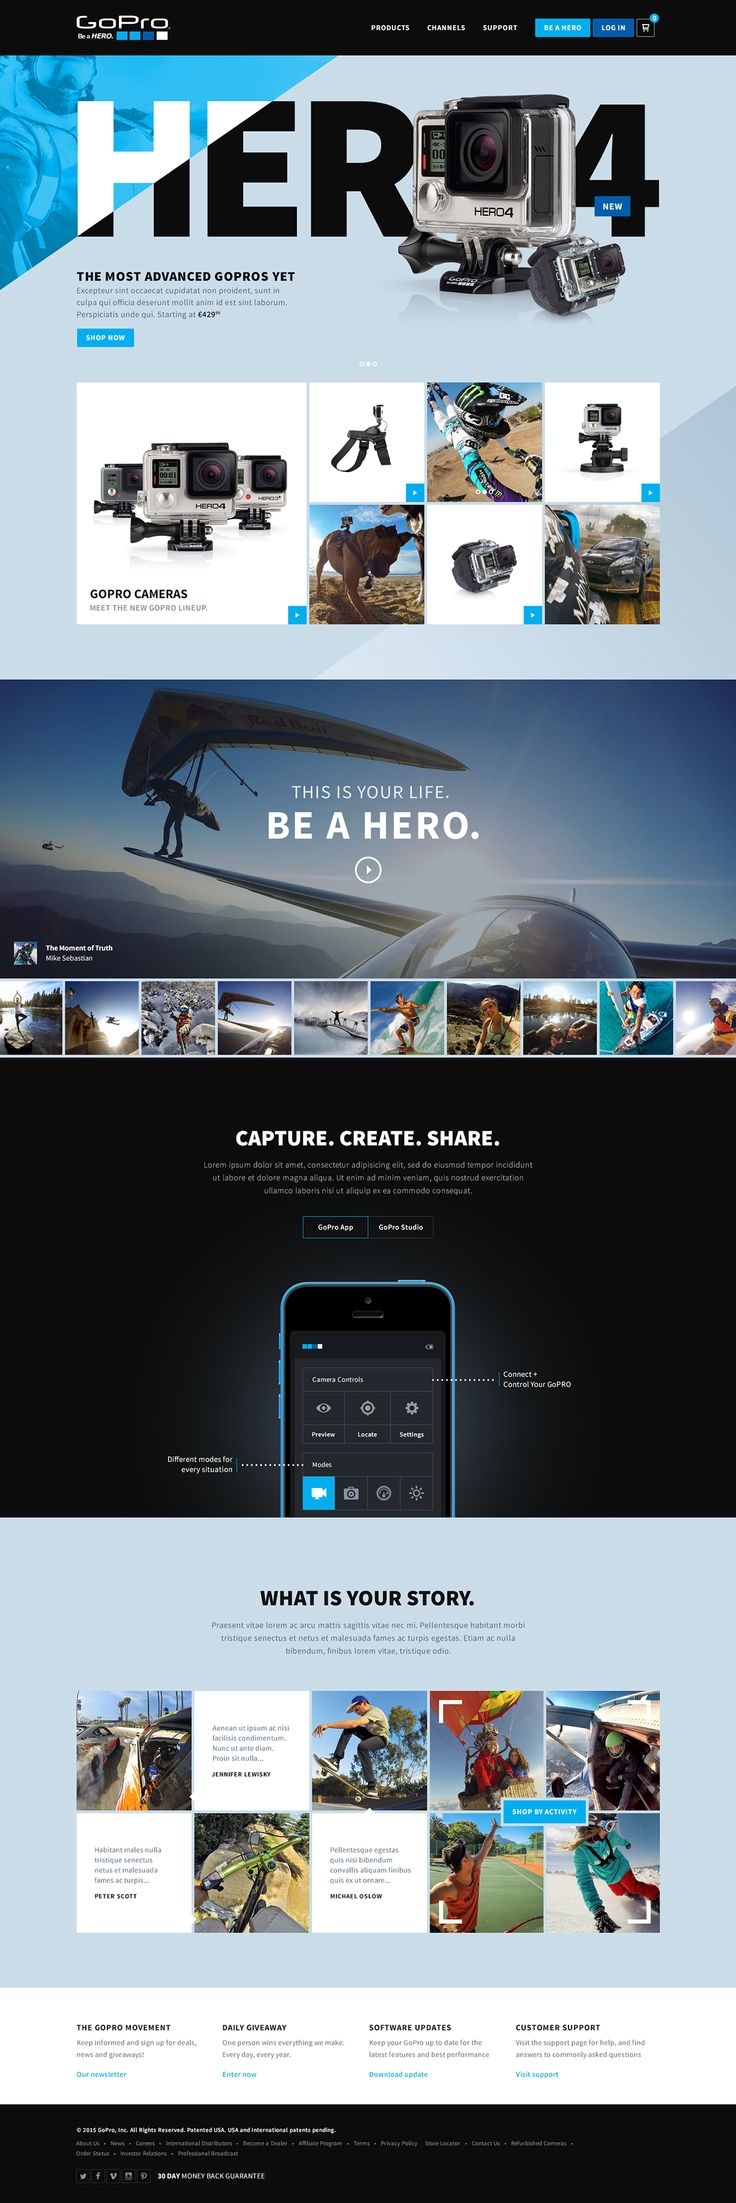 GoPro on Behance